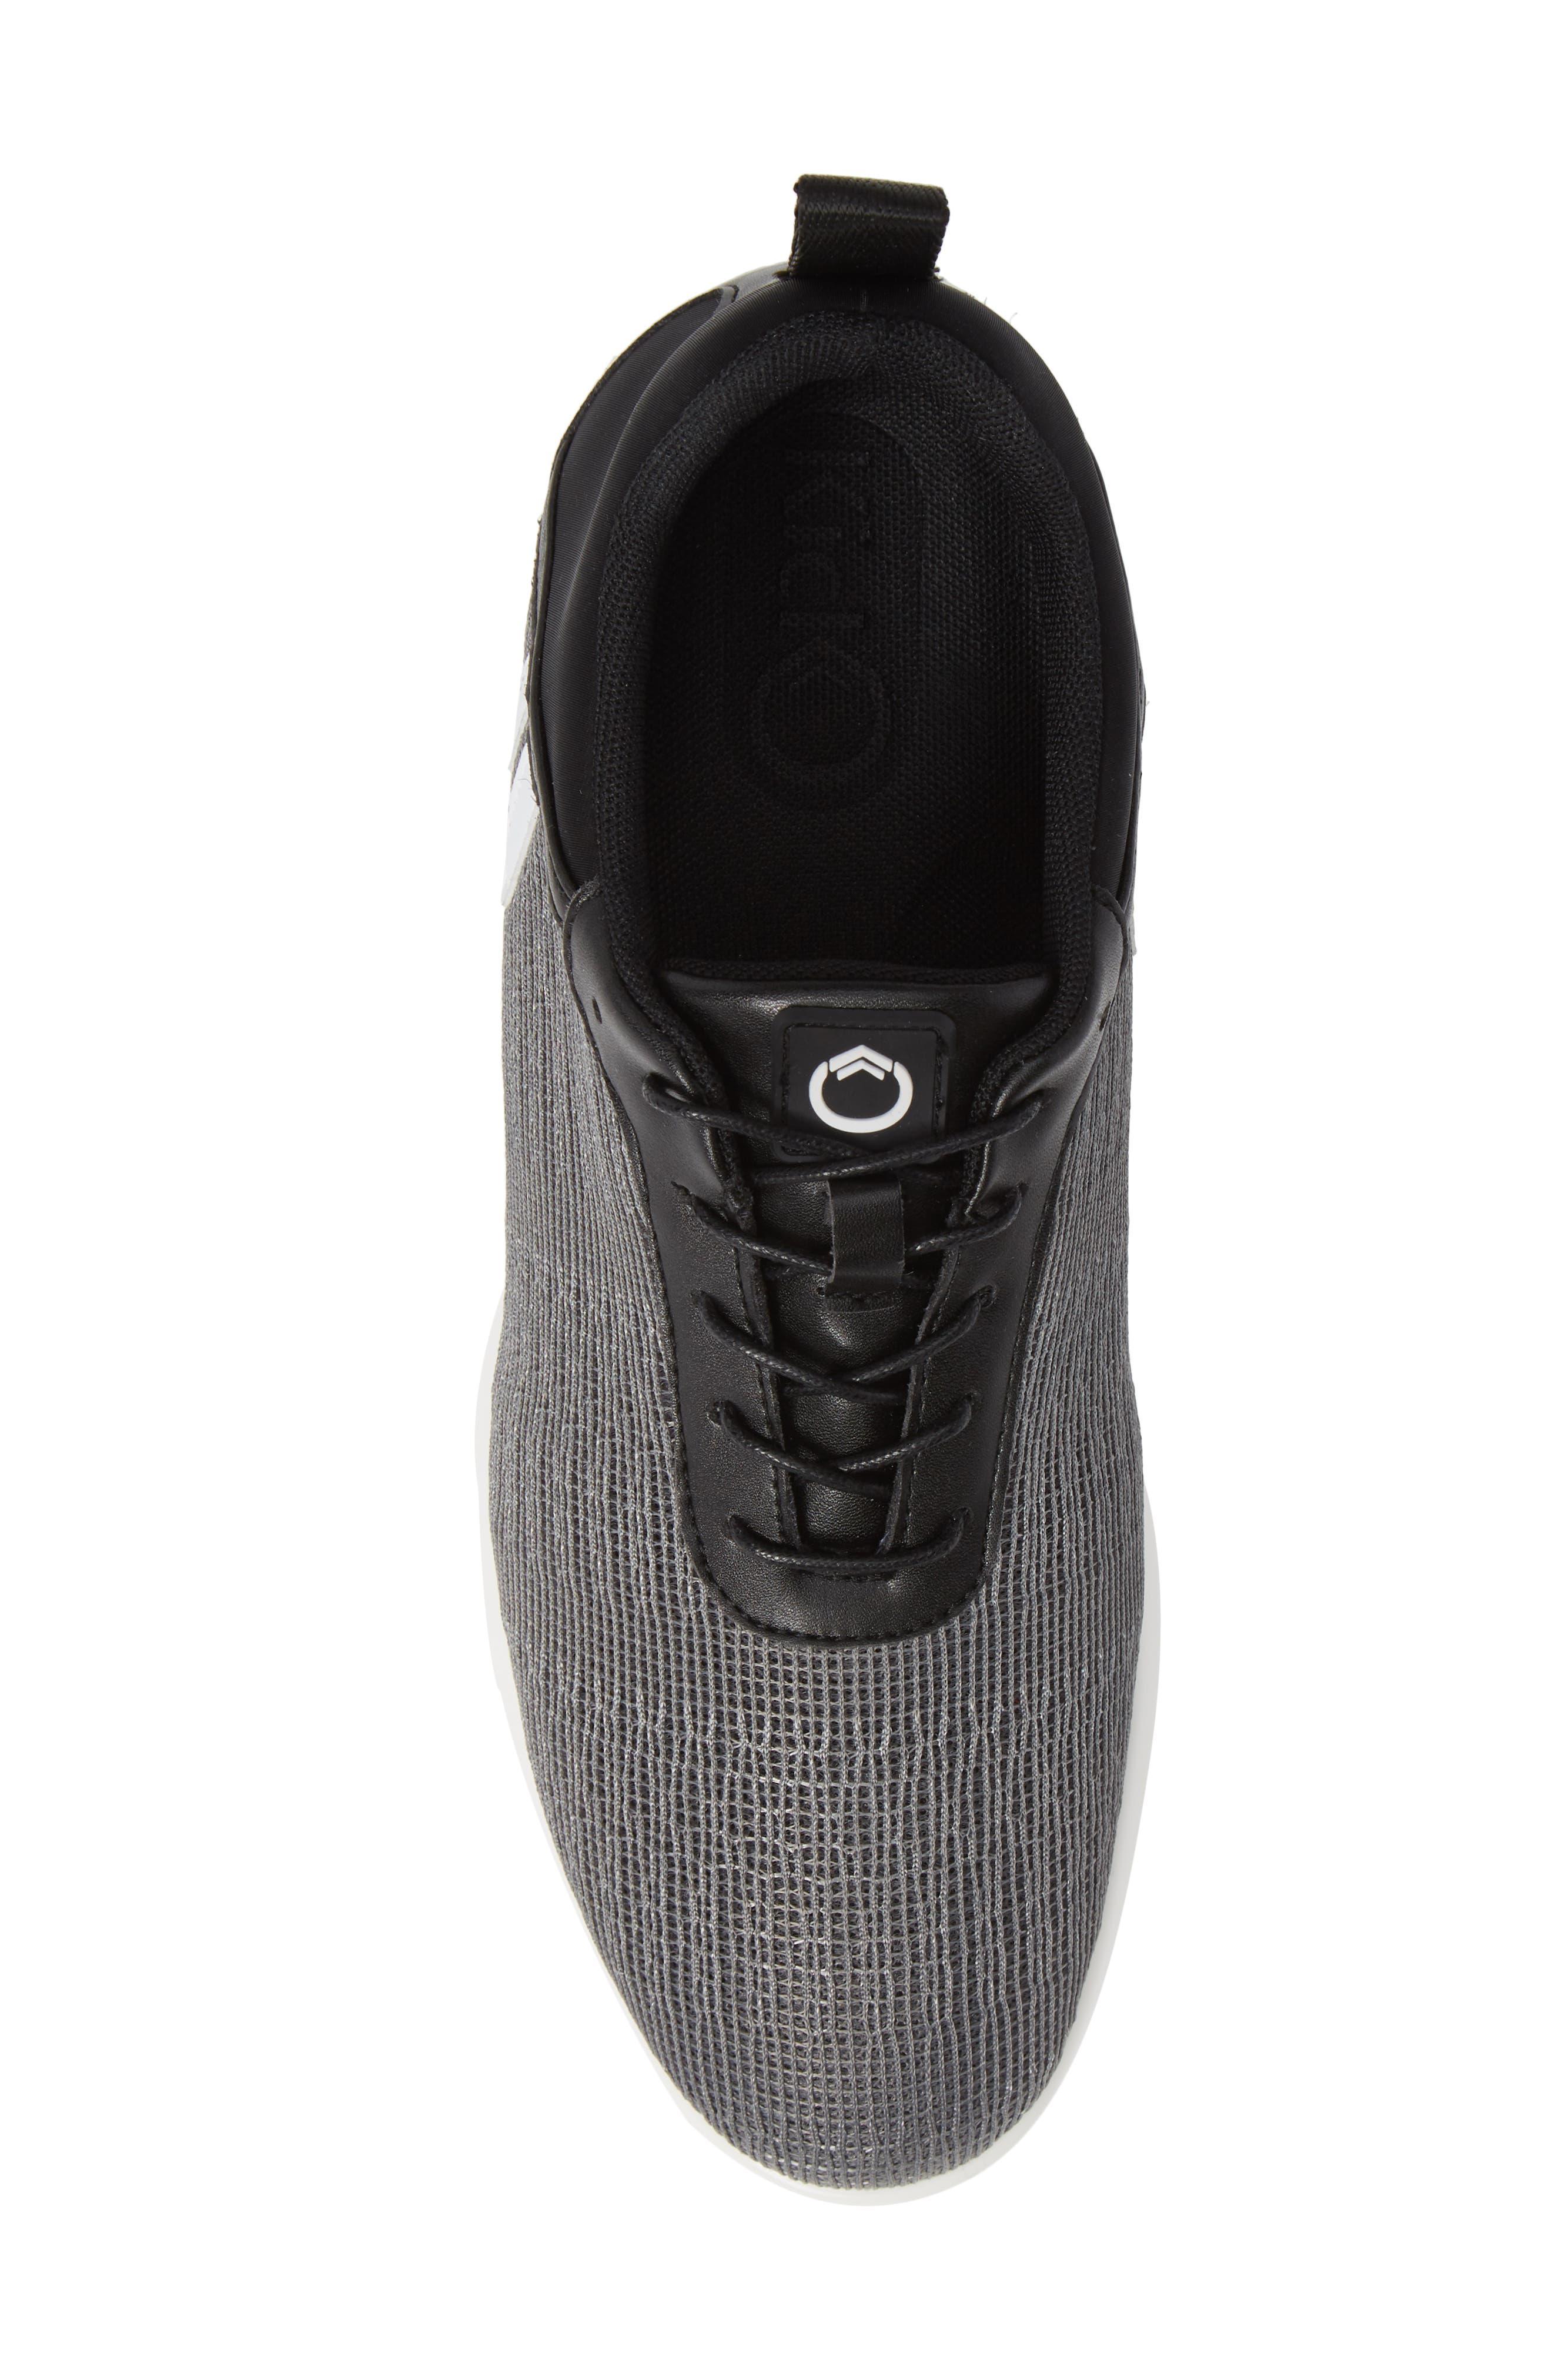 Foam Sneaker,                             Alternate thumbnail 5, color,                             021